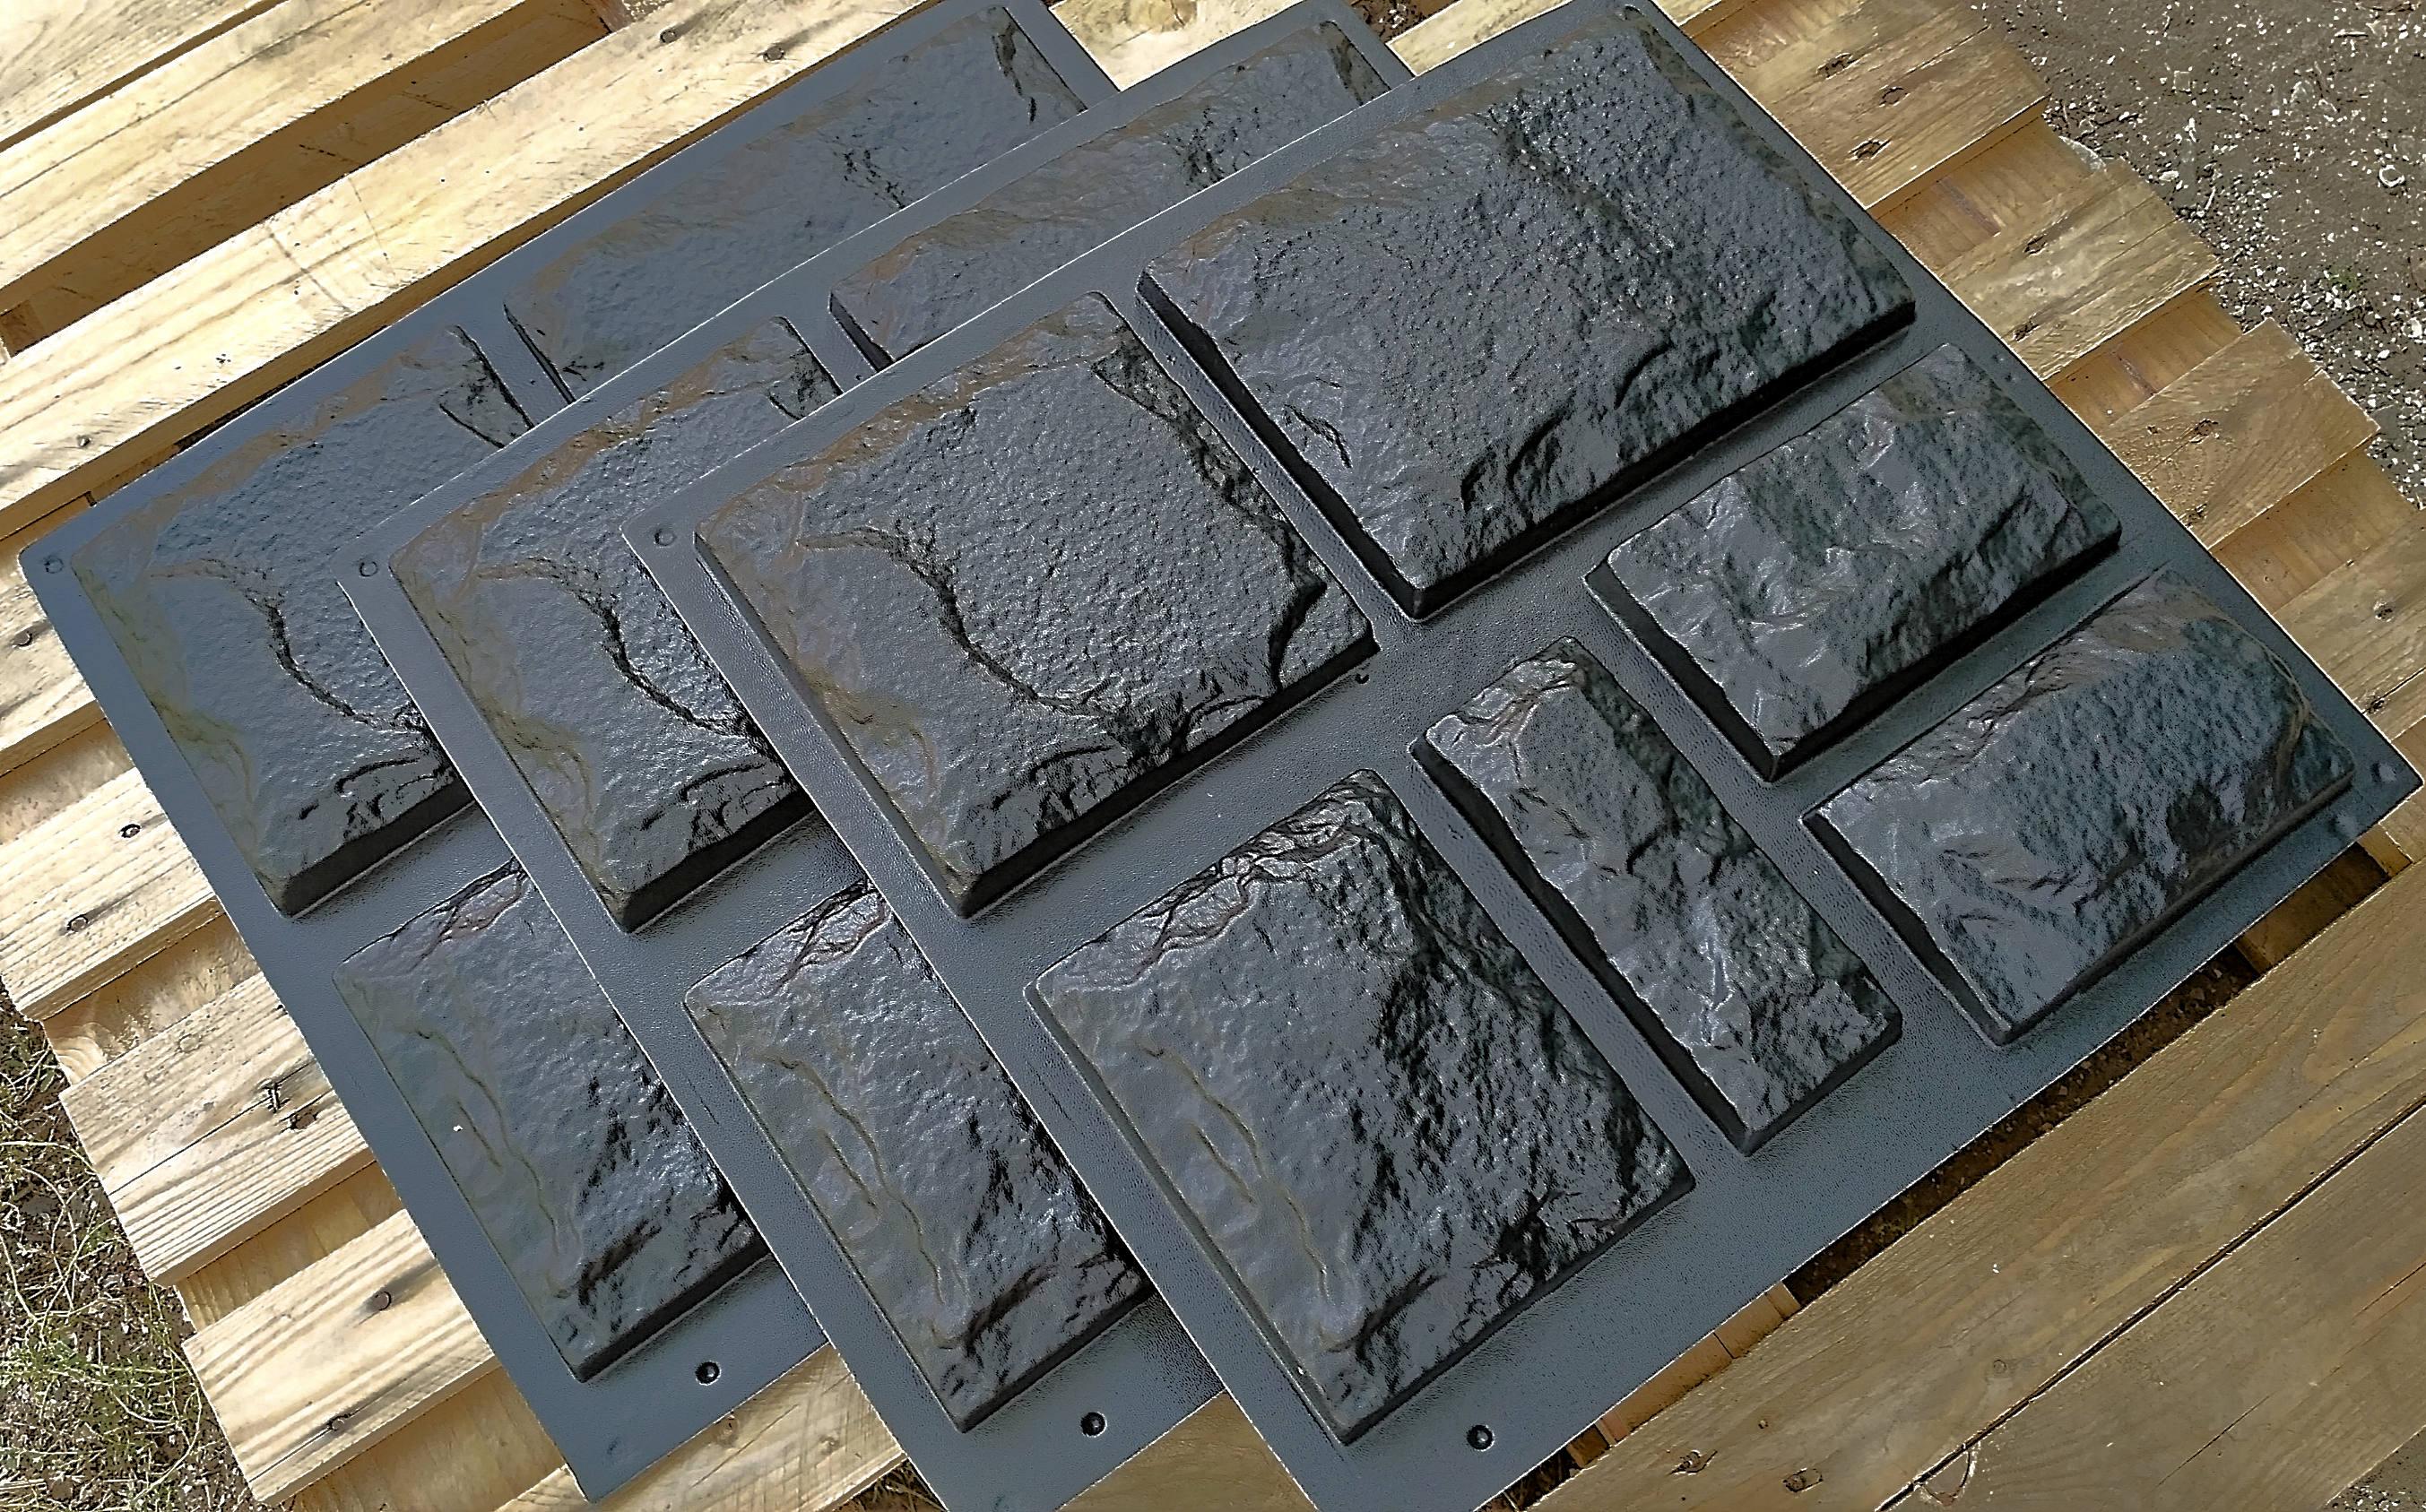 kunststoff formen f r gips und beton dekorativen steines. Black Bedroom Furniture Sets. Home Design Ideas